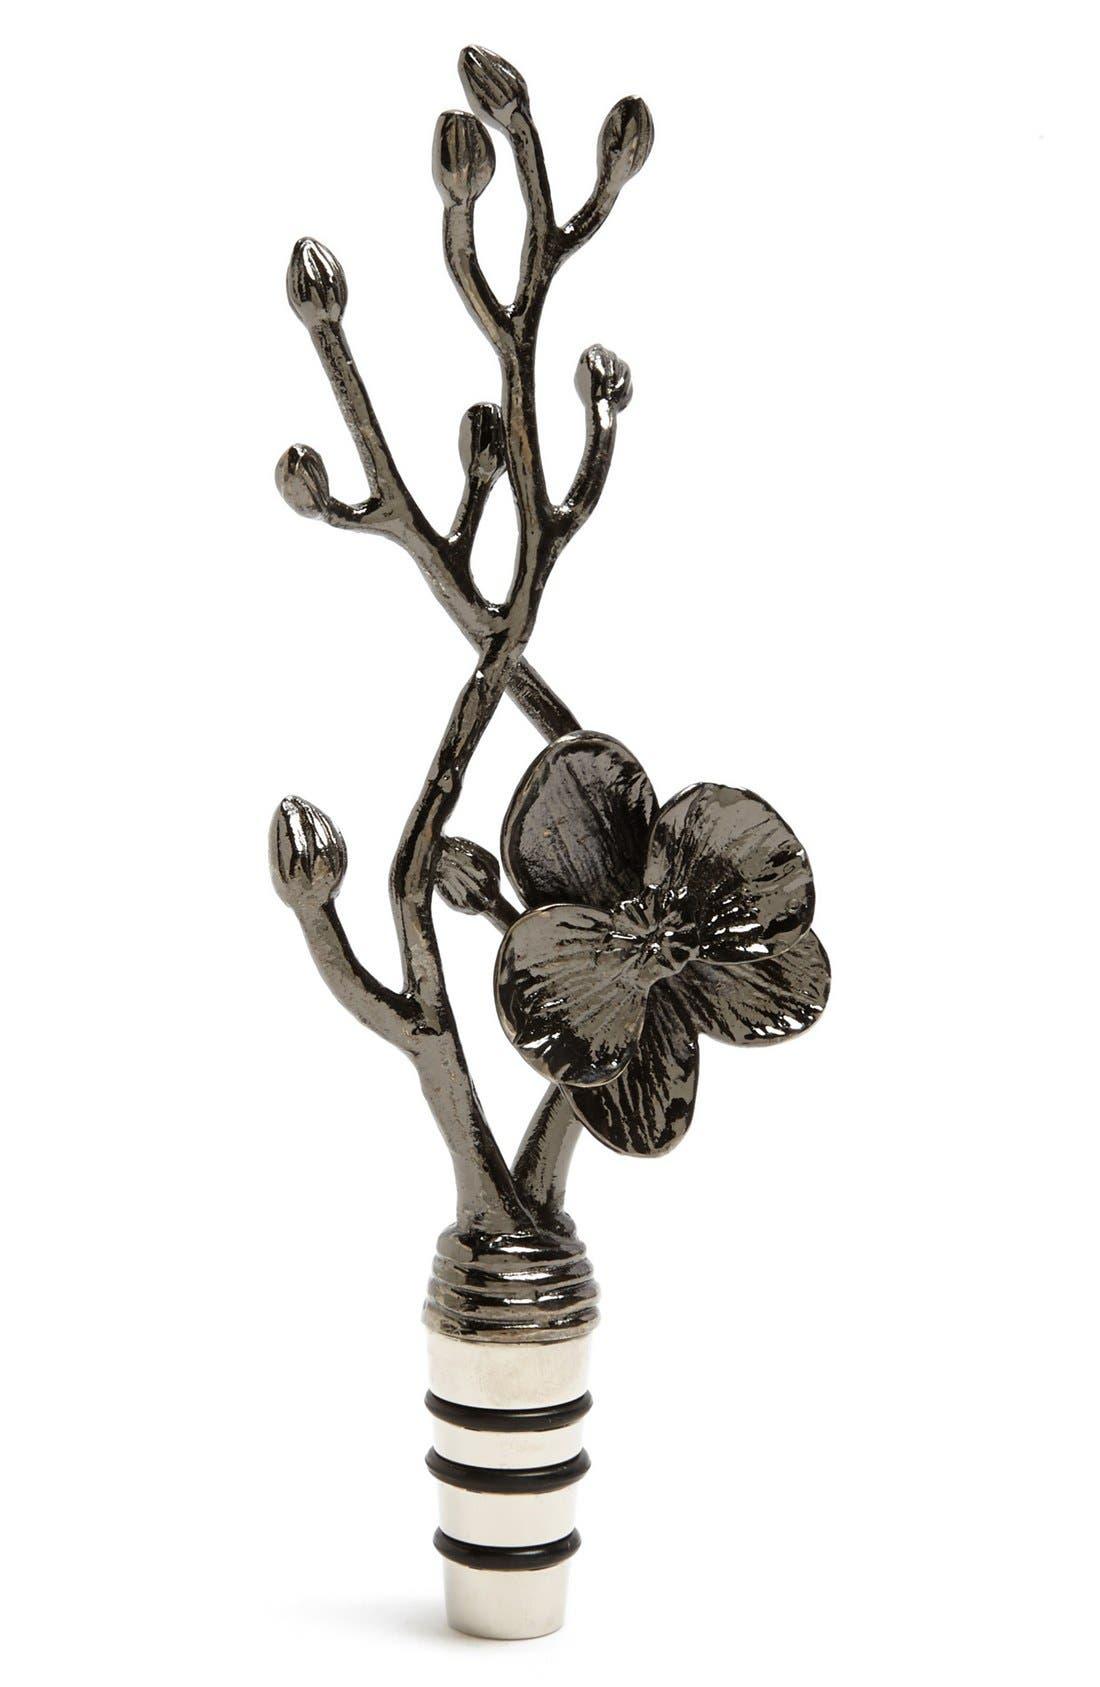 Alternate Image 1 Selected - Michael Aram 'Black Orchid' Wine Stopper